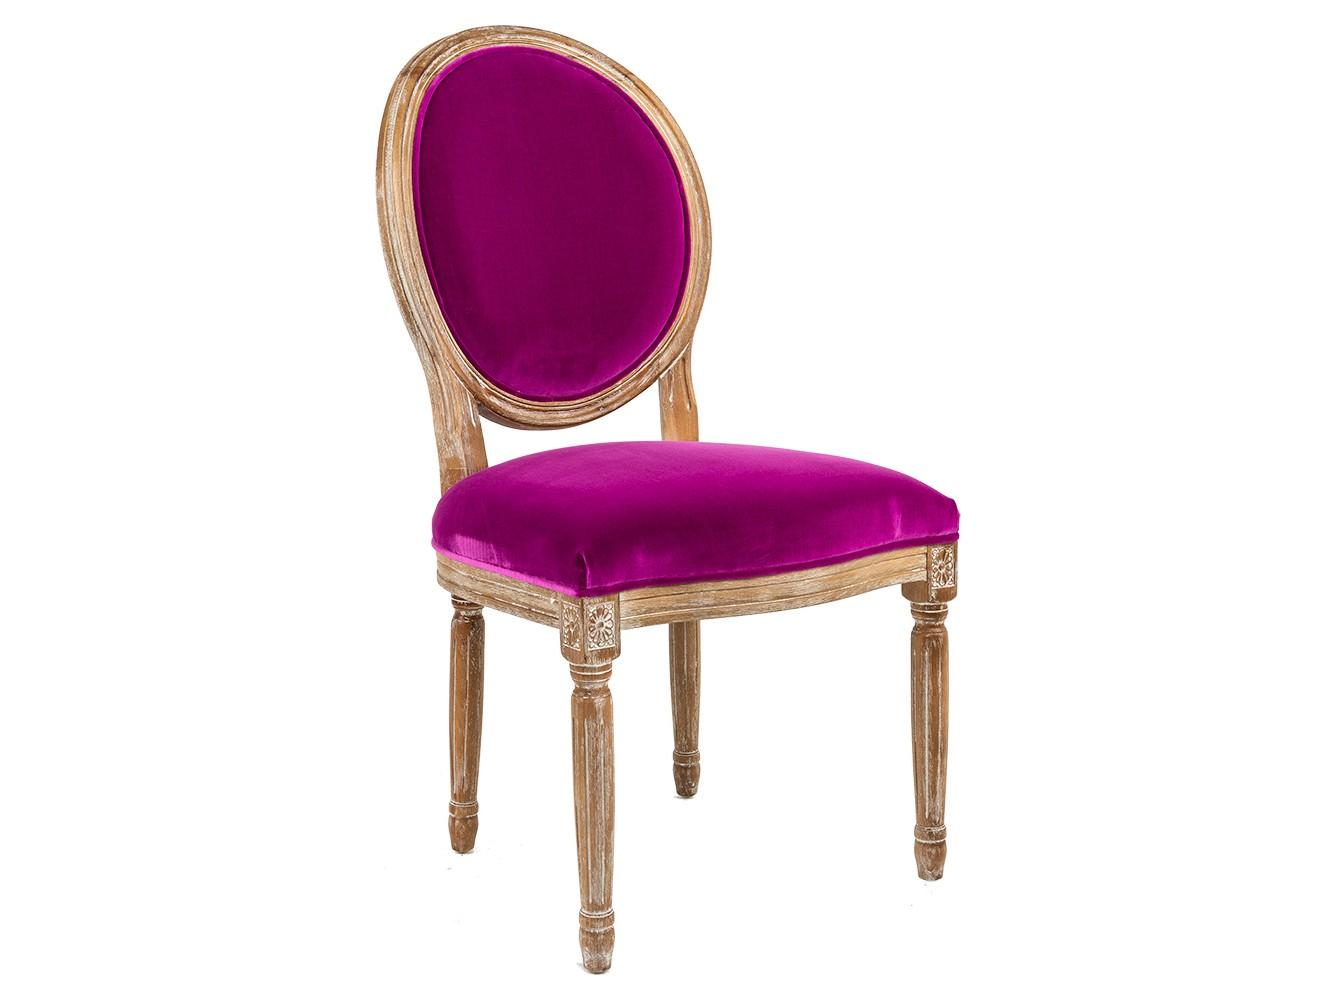 Кухонный стул Object Desire 15438254 от thefurnish